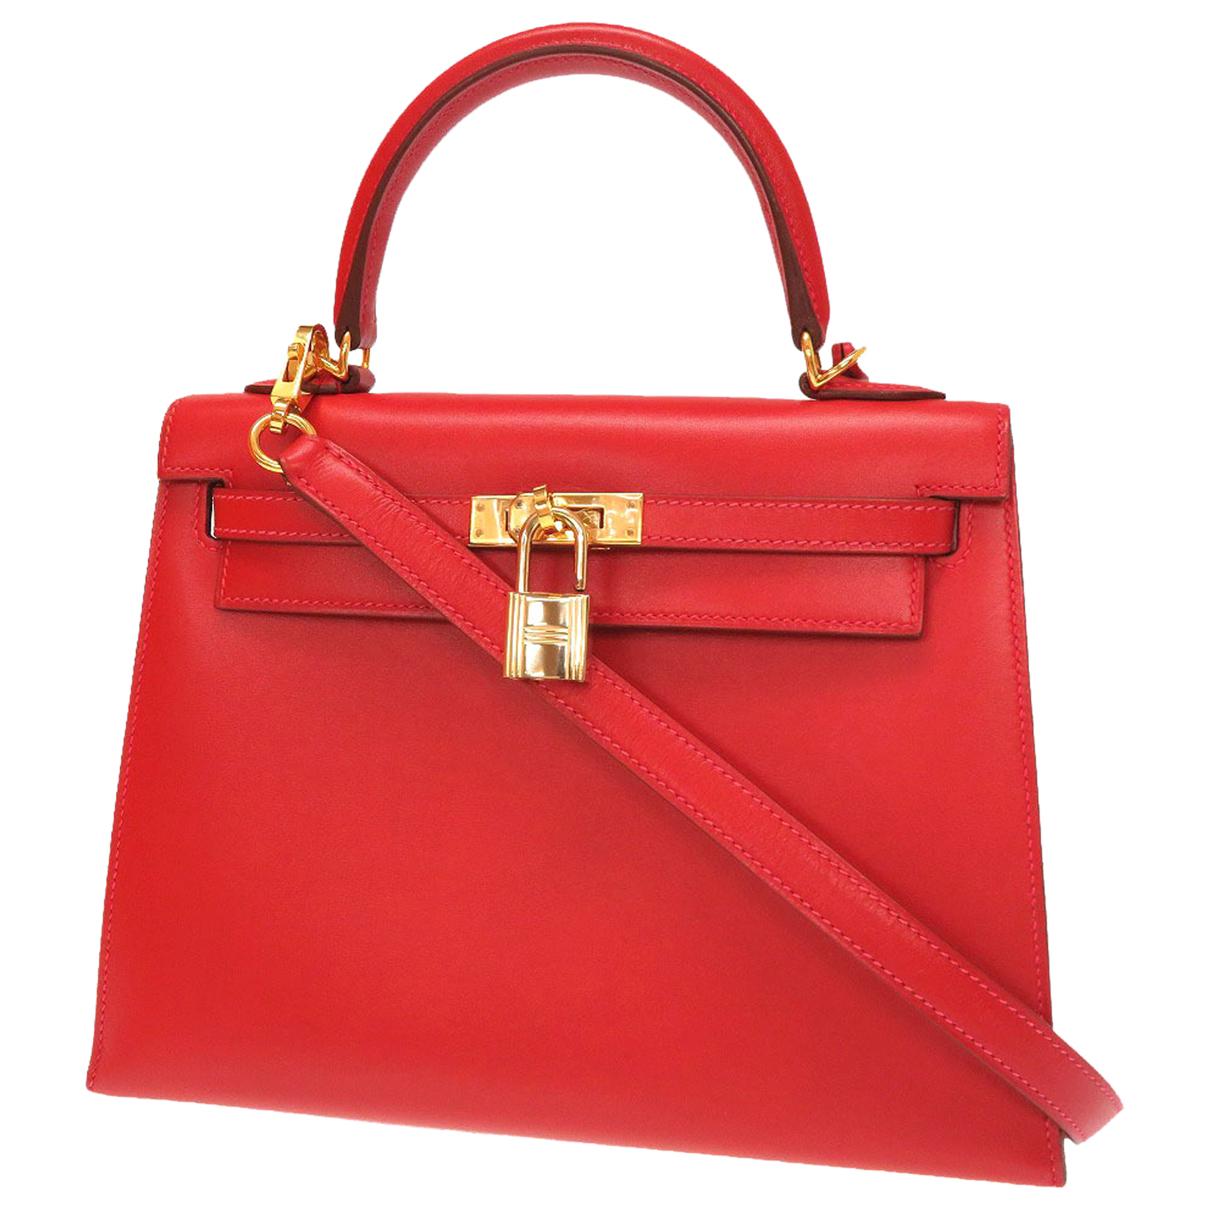 Hermes Kelly 25 Handtasche in  Rot Leder